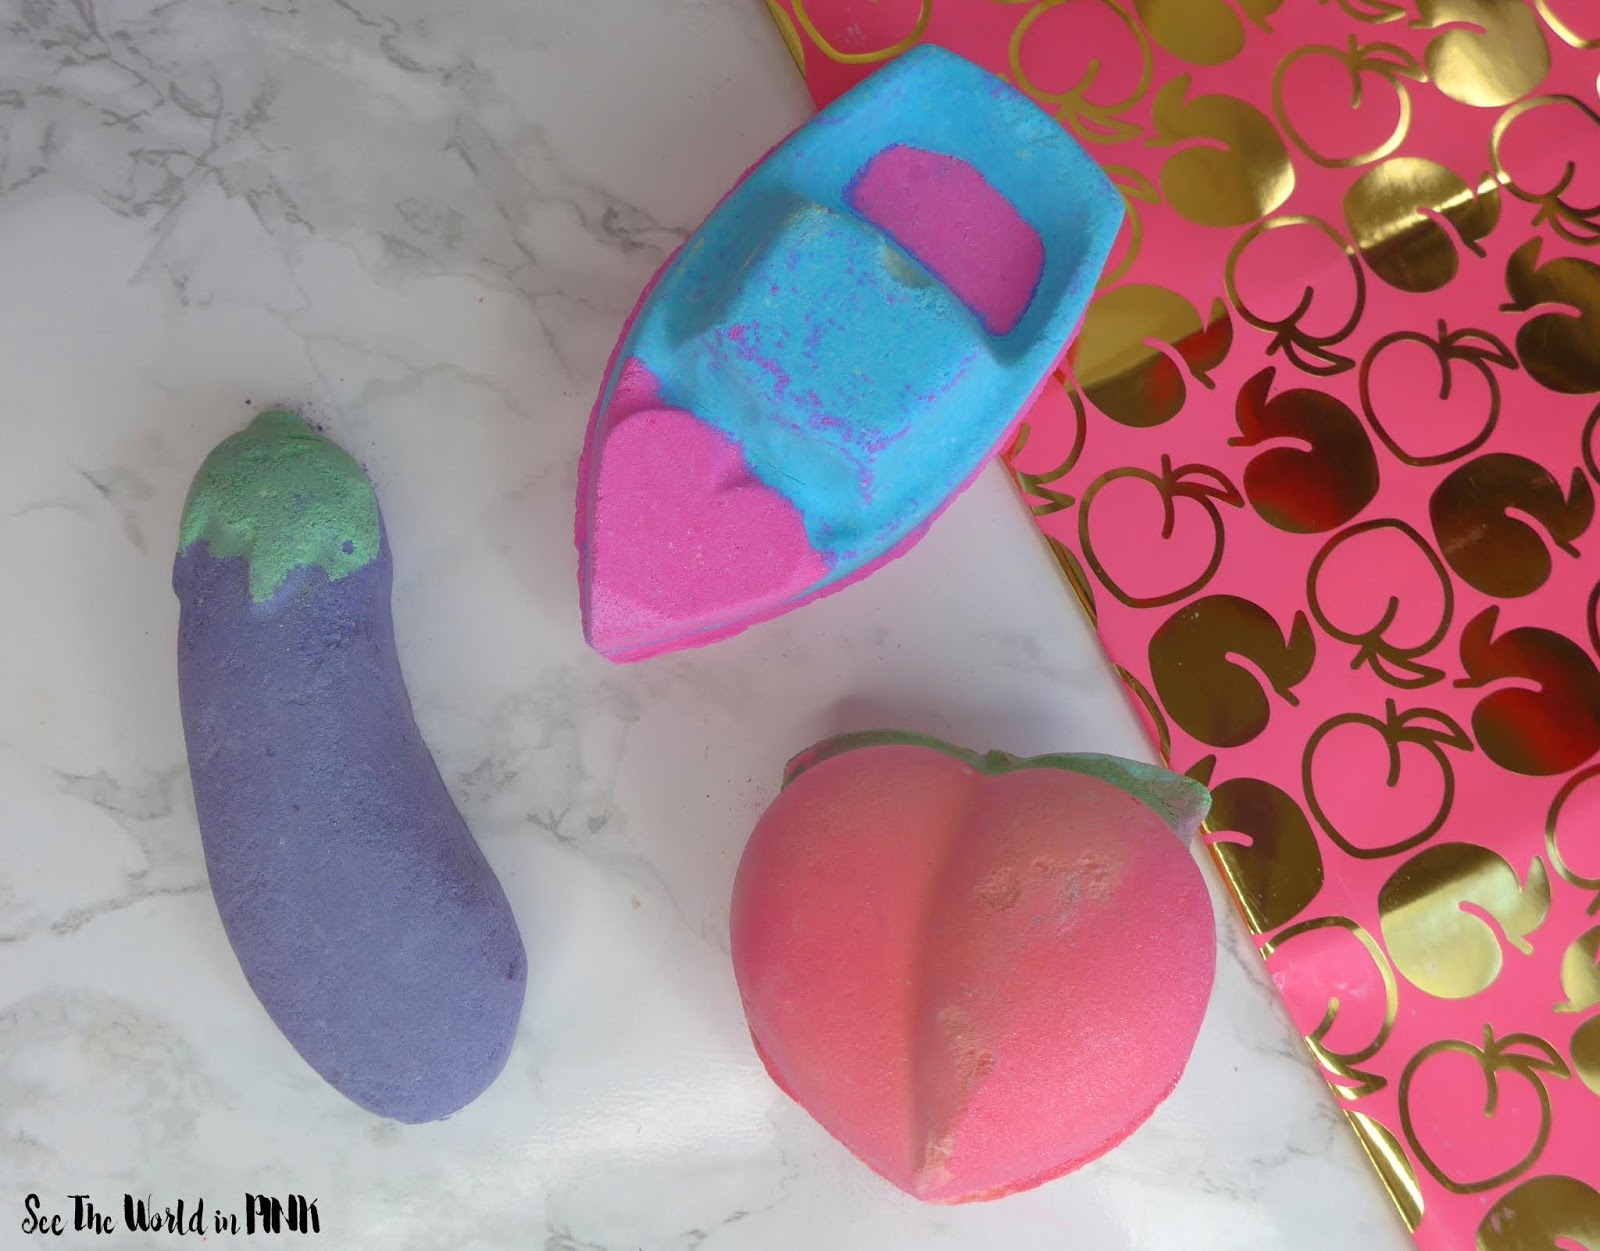 Lush Valentine's Day Bath Bombs